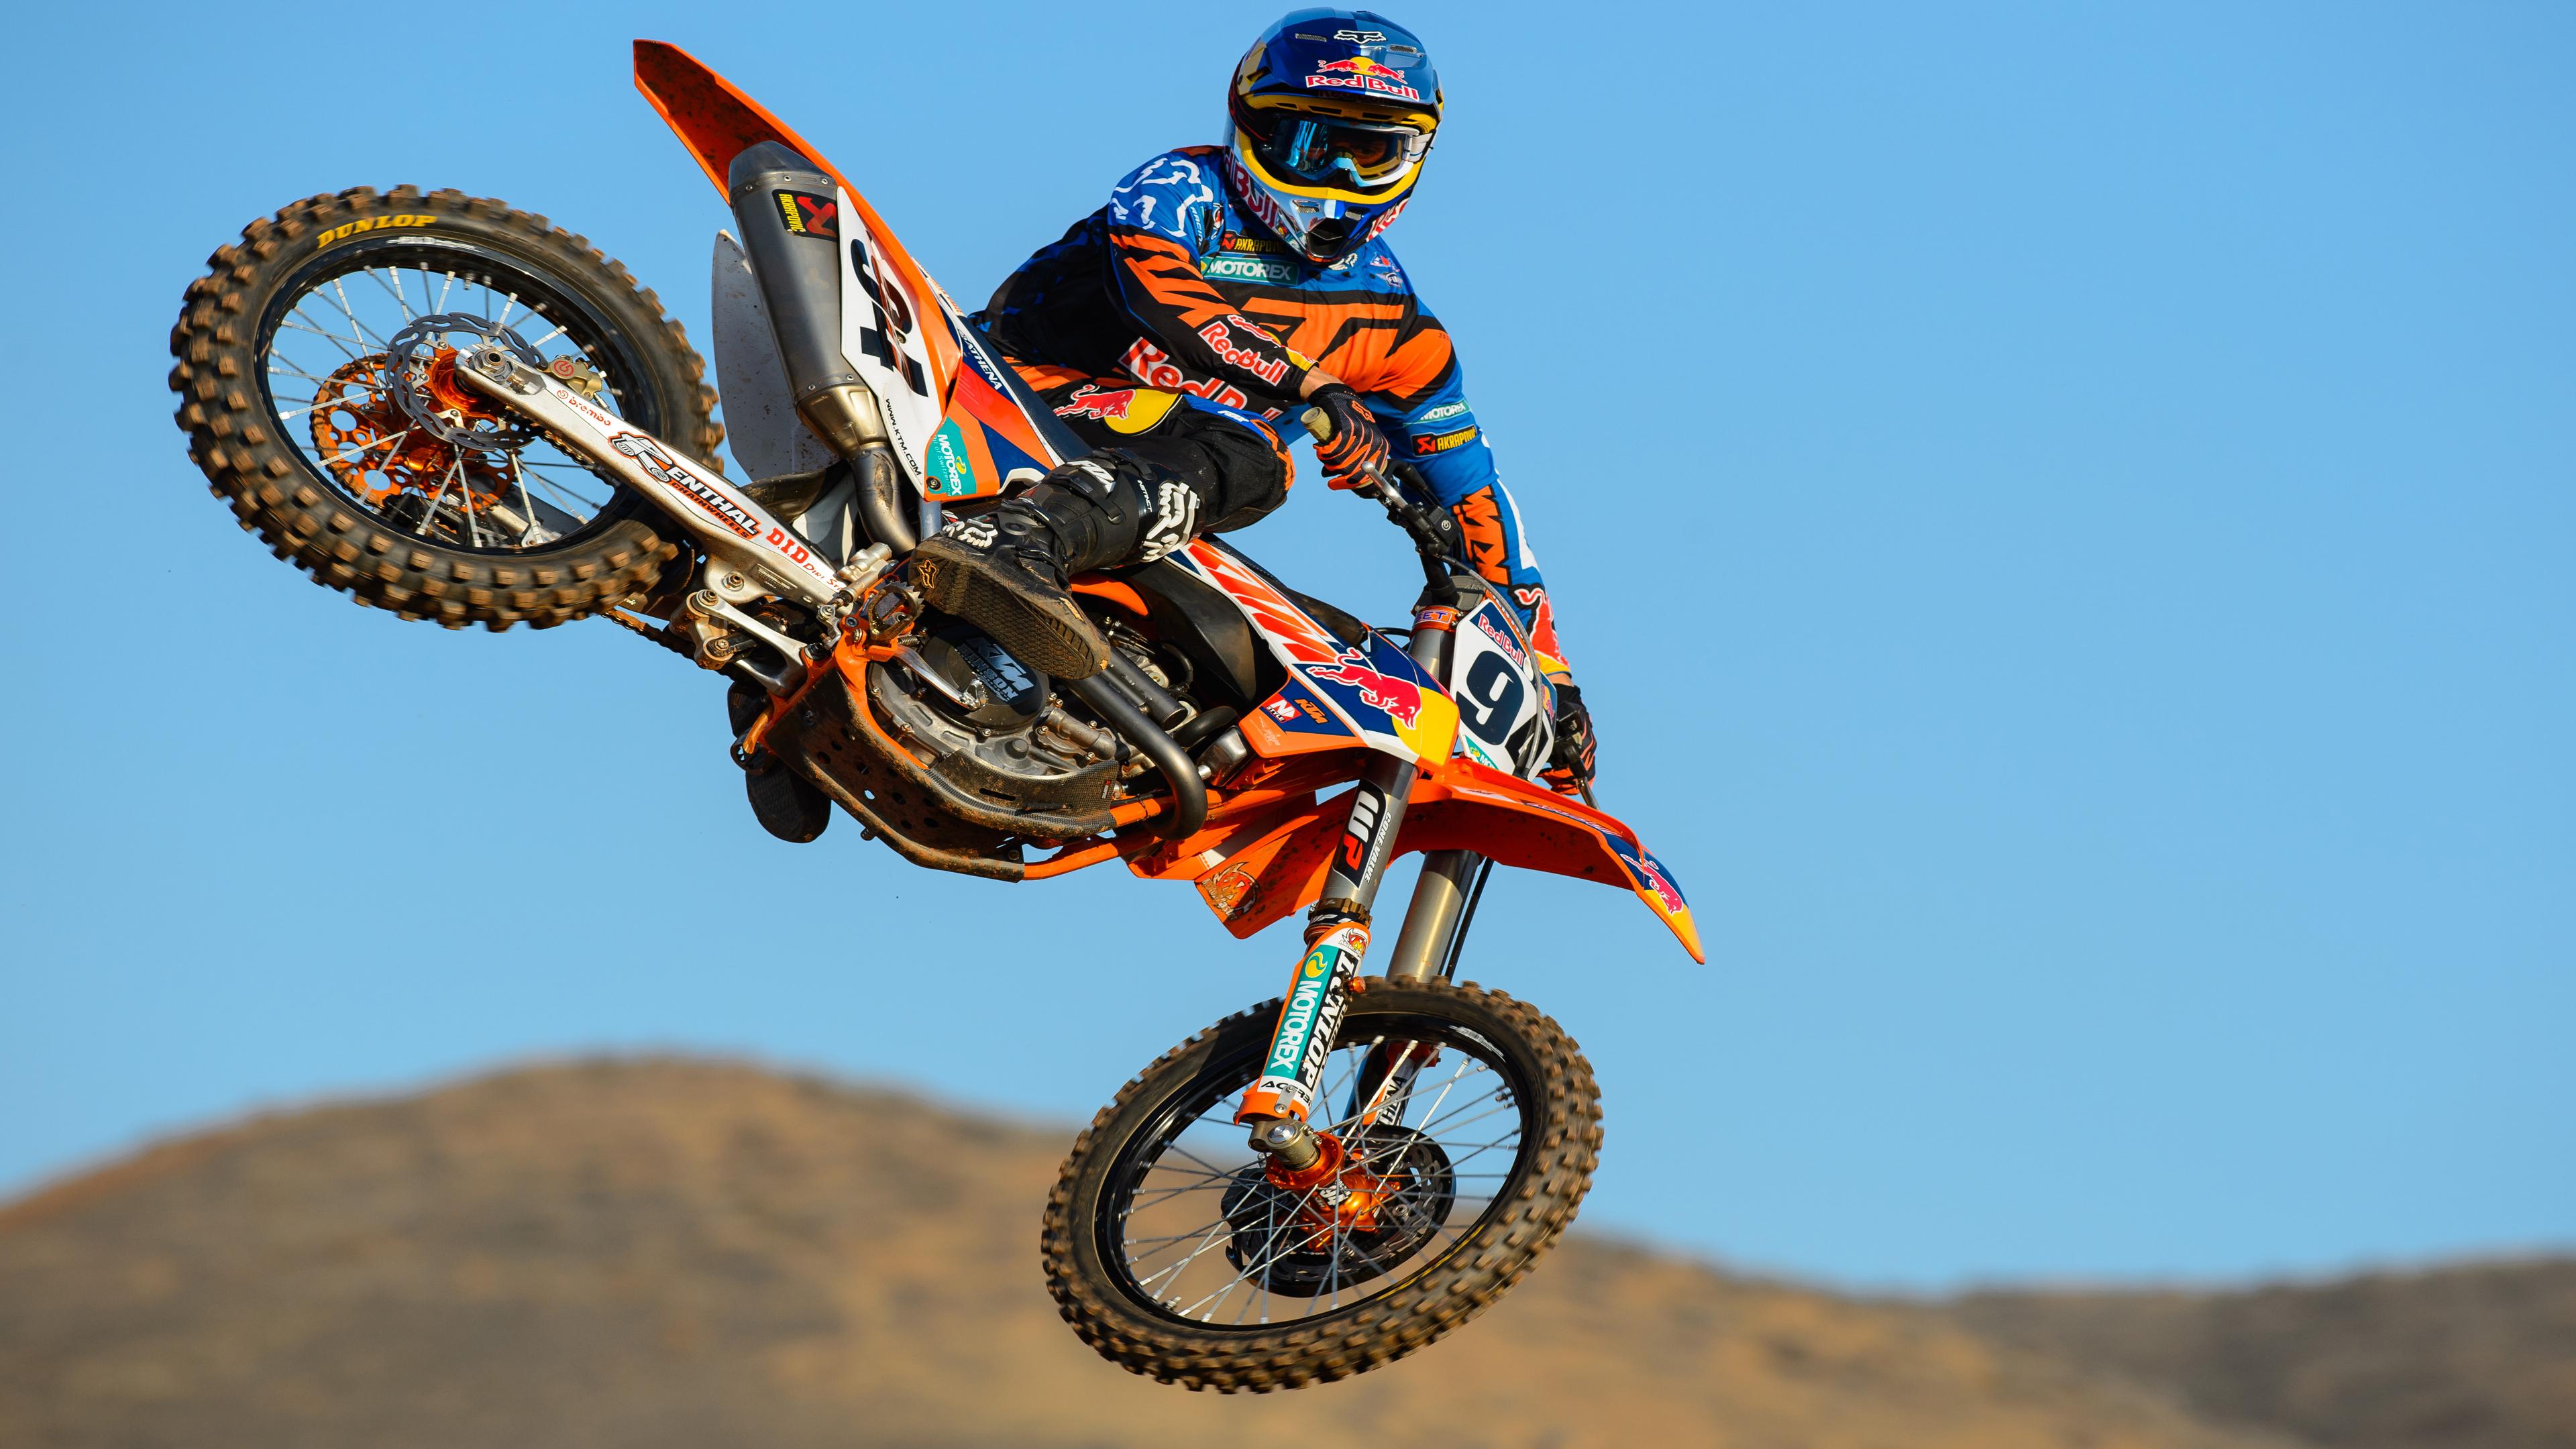 Fotos   Wallpapers De Motocross Hd 3840x2160